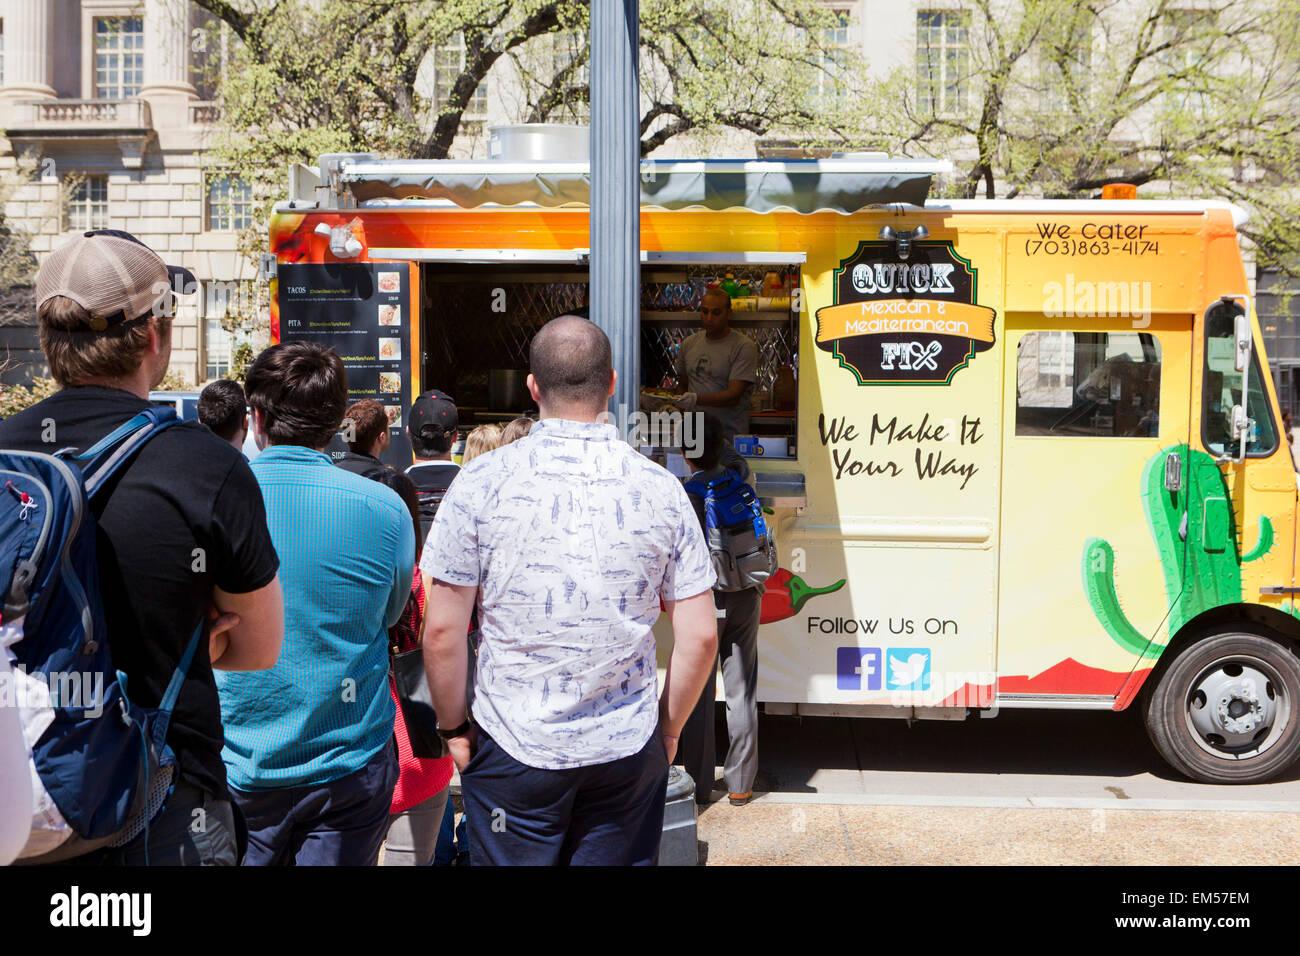 People queue up at an urban food truck - USA - Stock Image